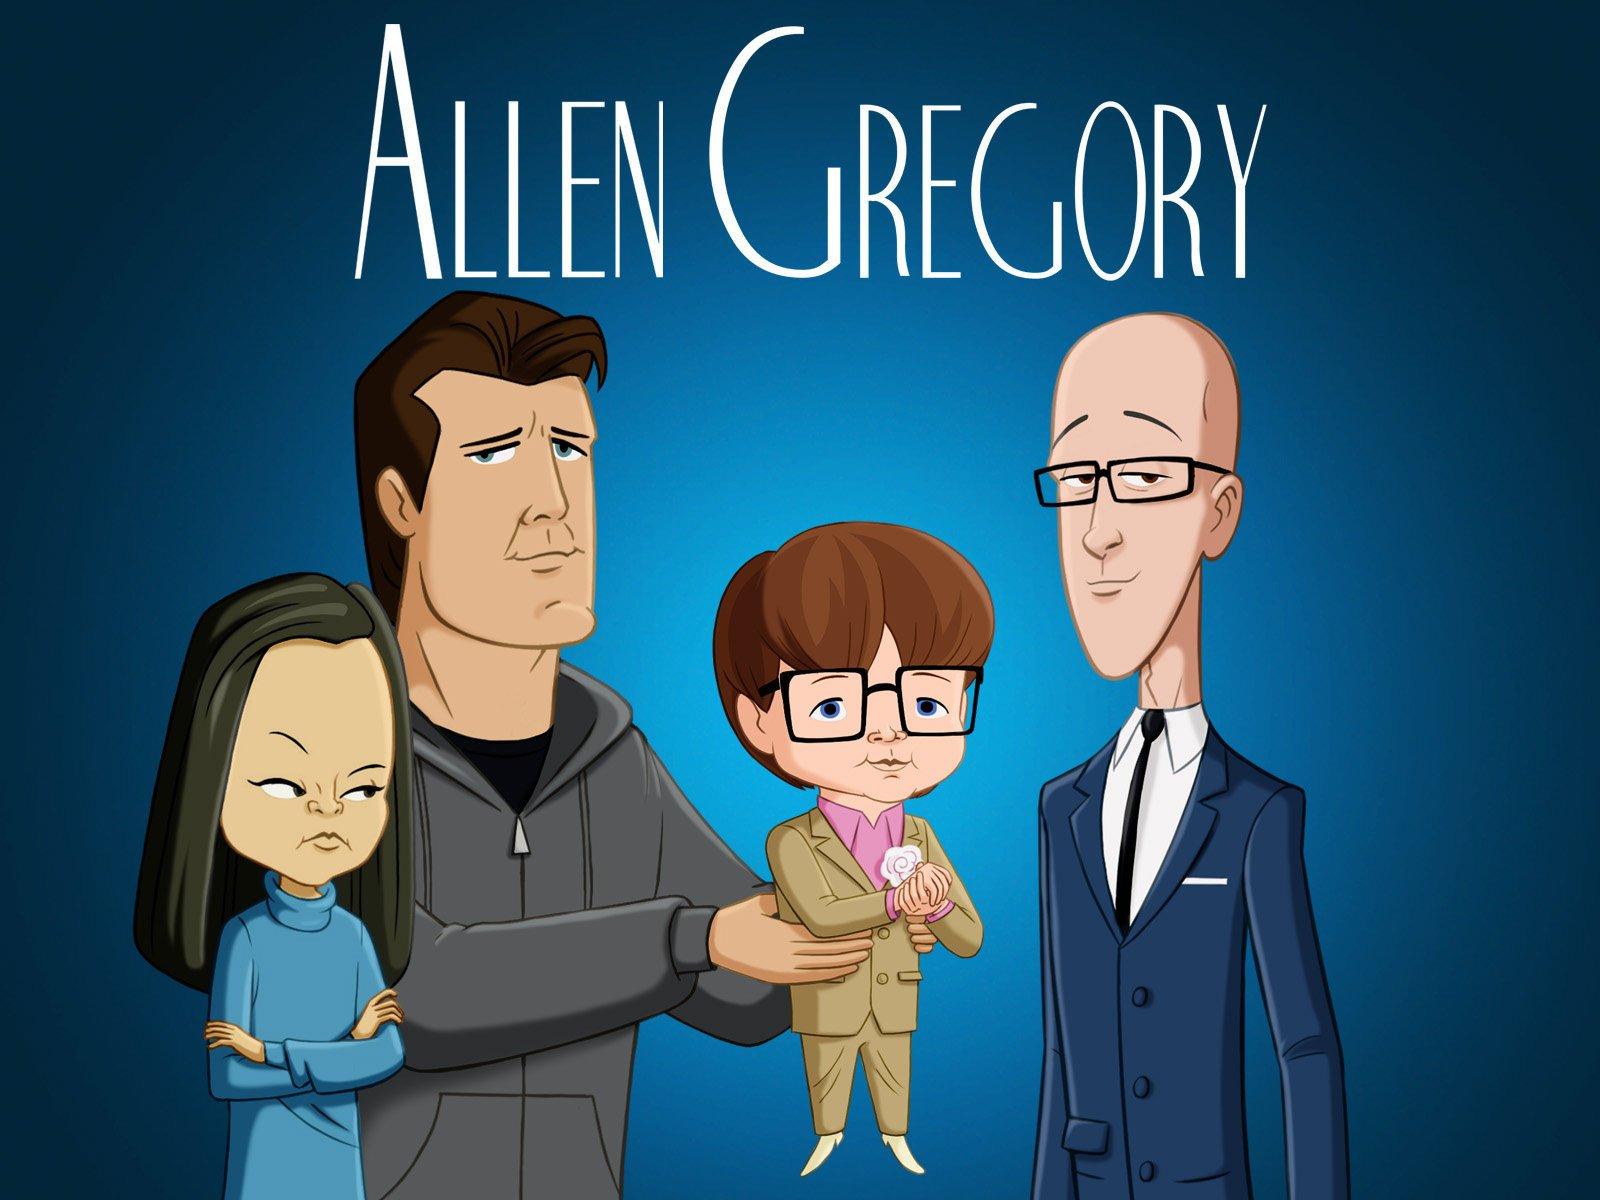 Alan gregory gay